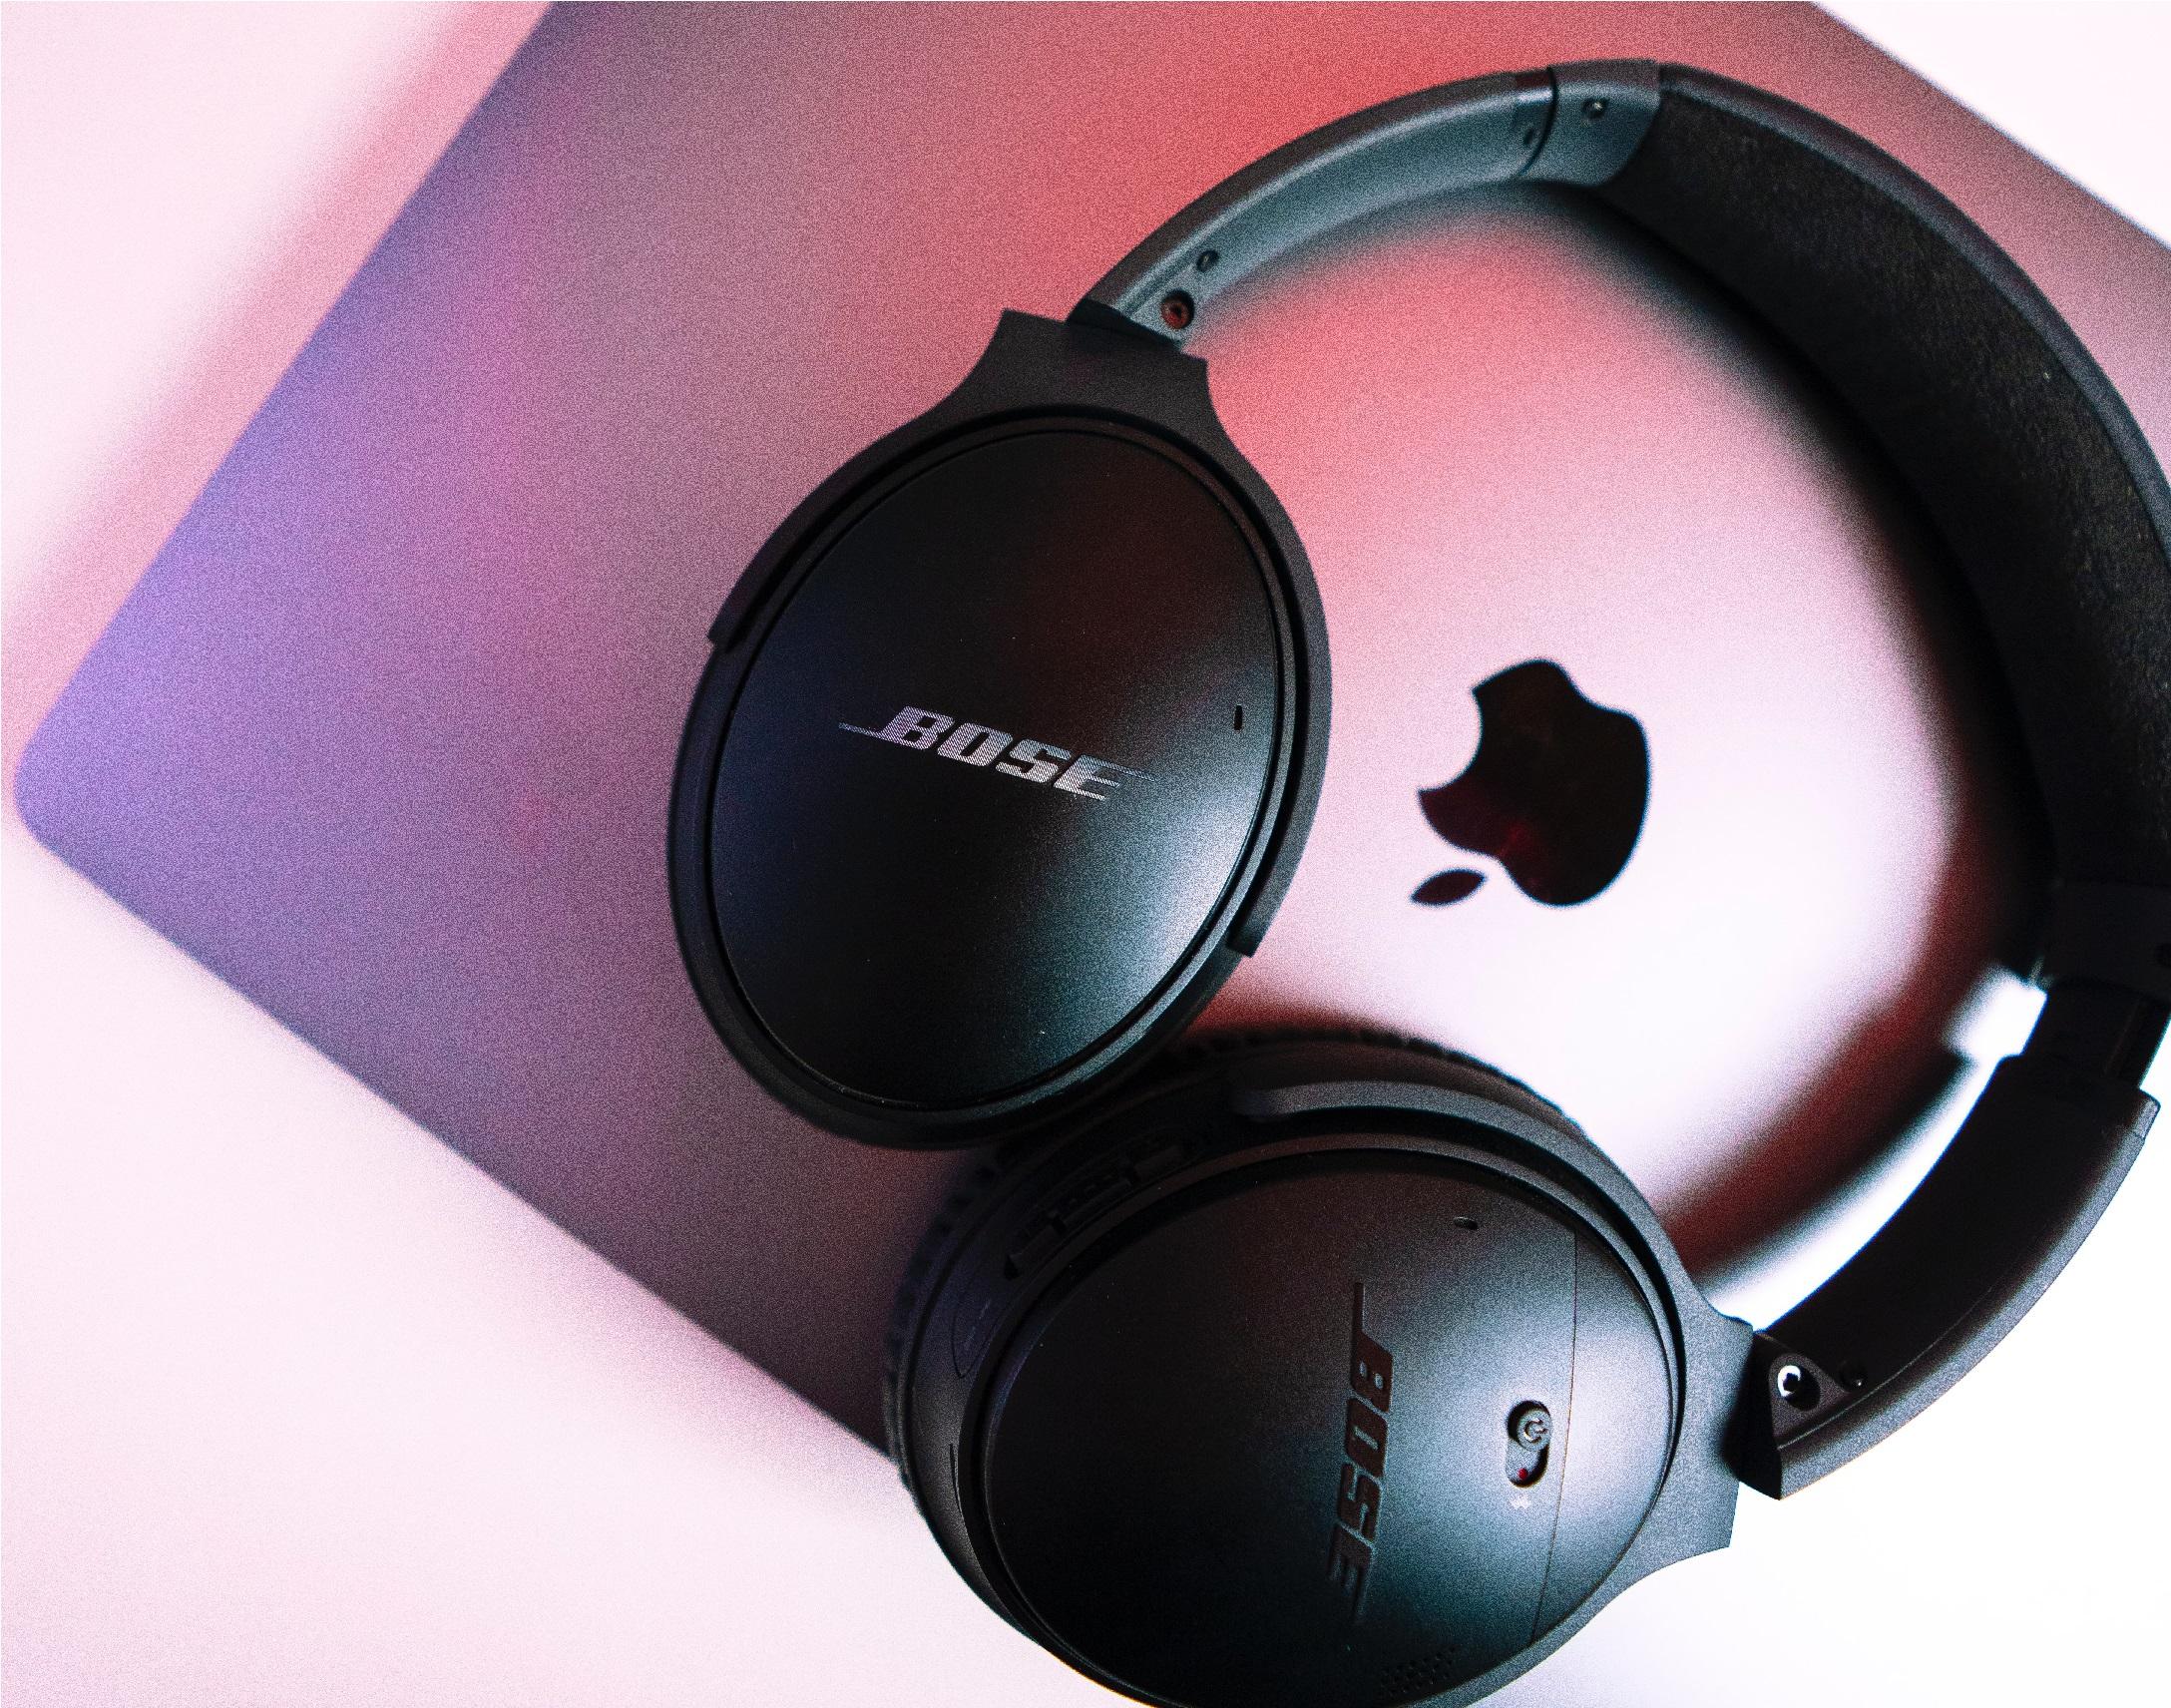 Cuffie Bose su PC Apple